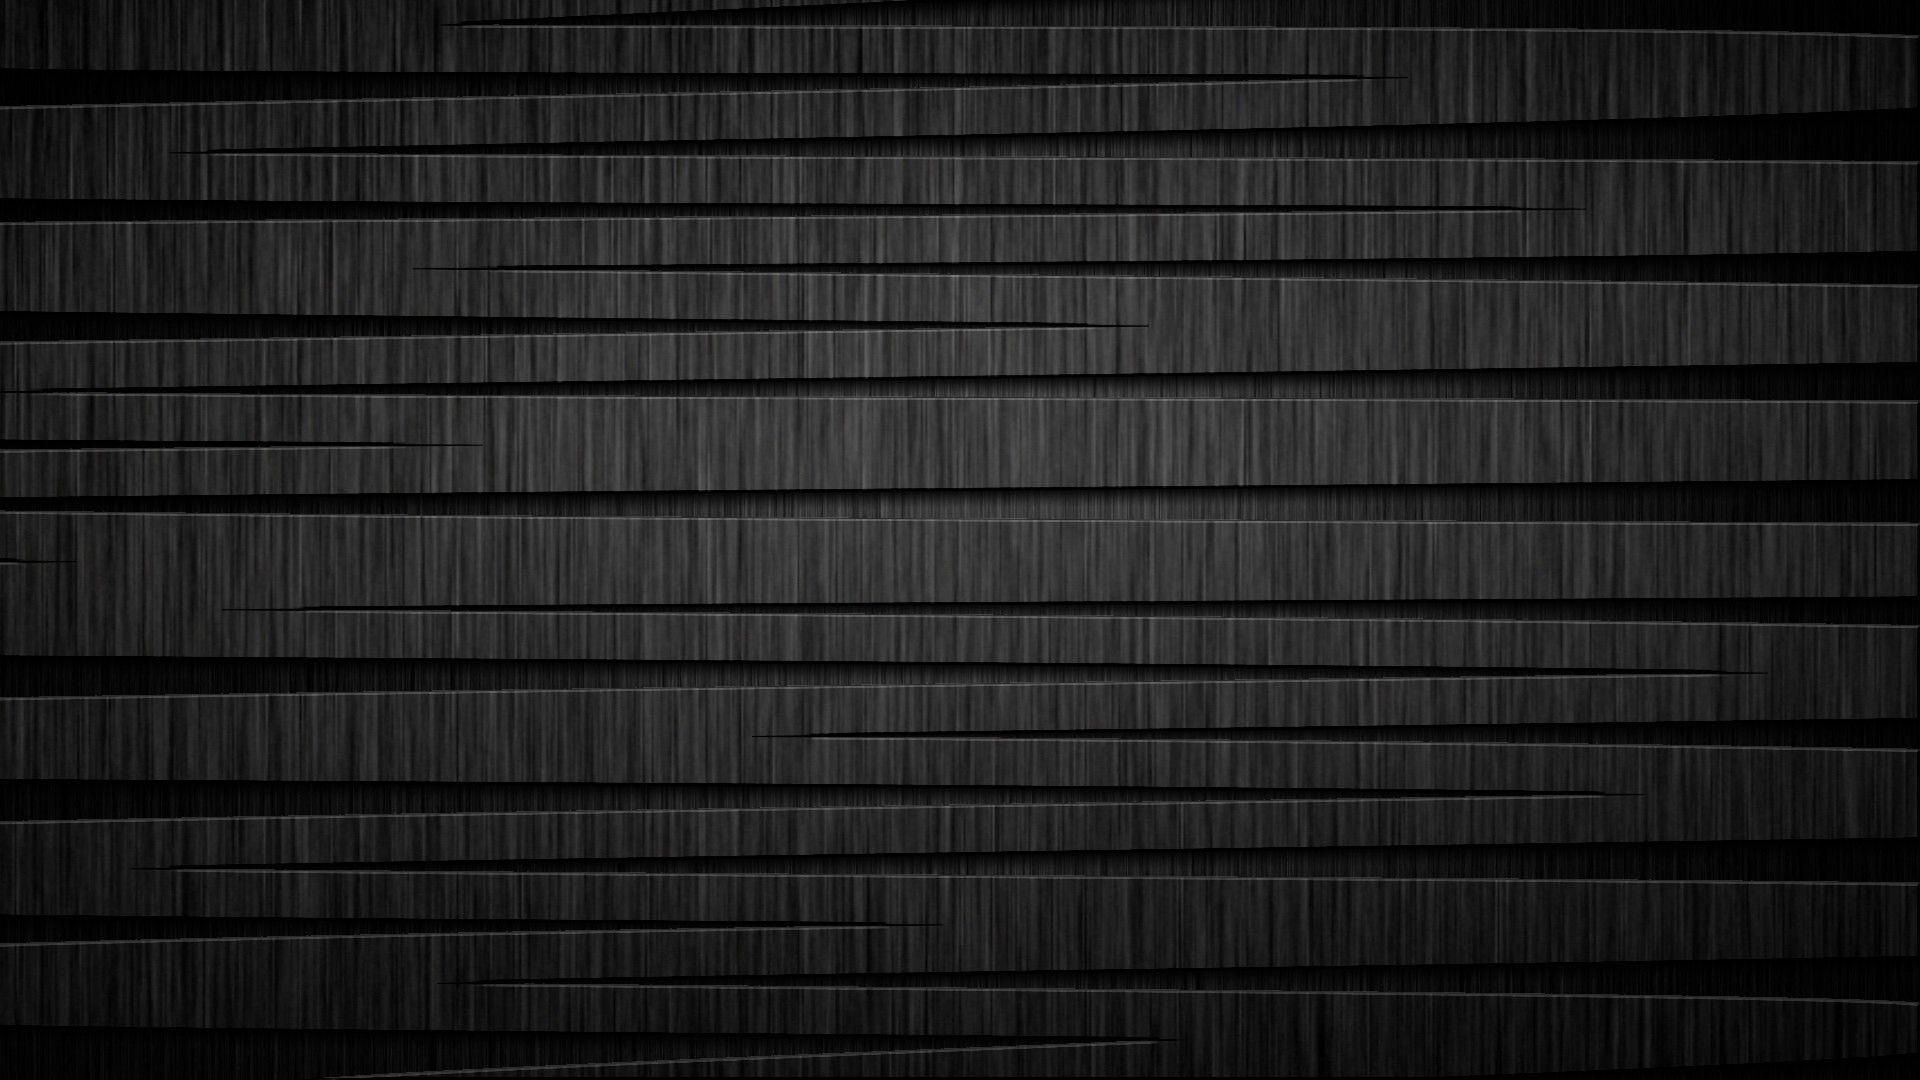 Black Pattern Background Wallpaper